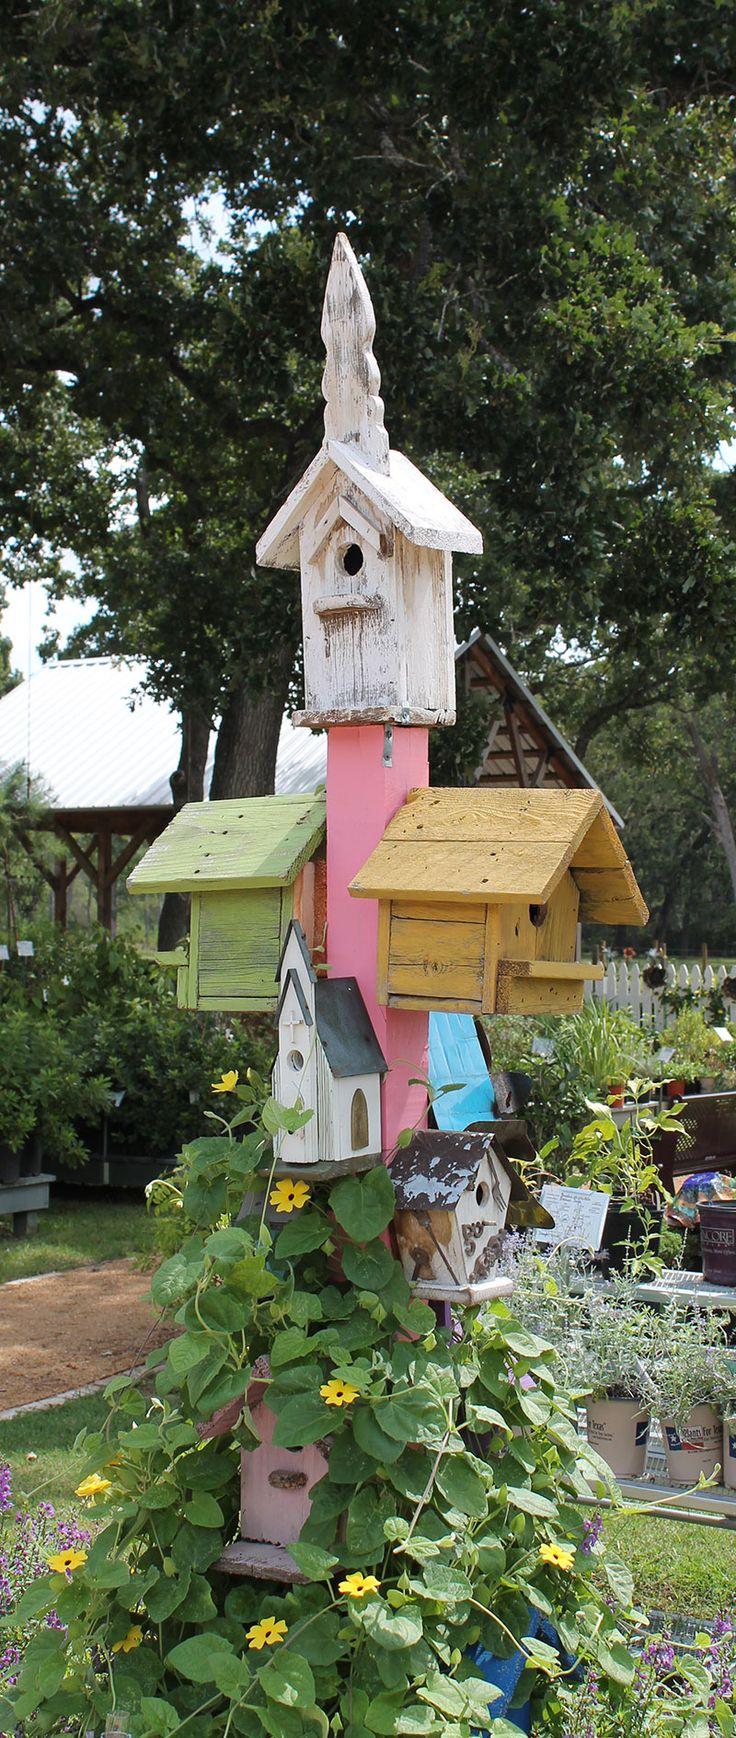 Wacky Creative Garden Art   Blending junk and vintage items into tasteful garden decor